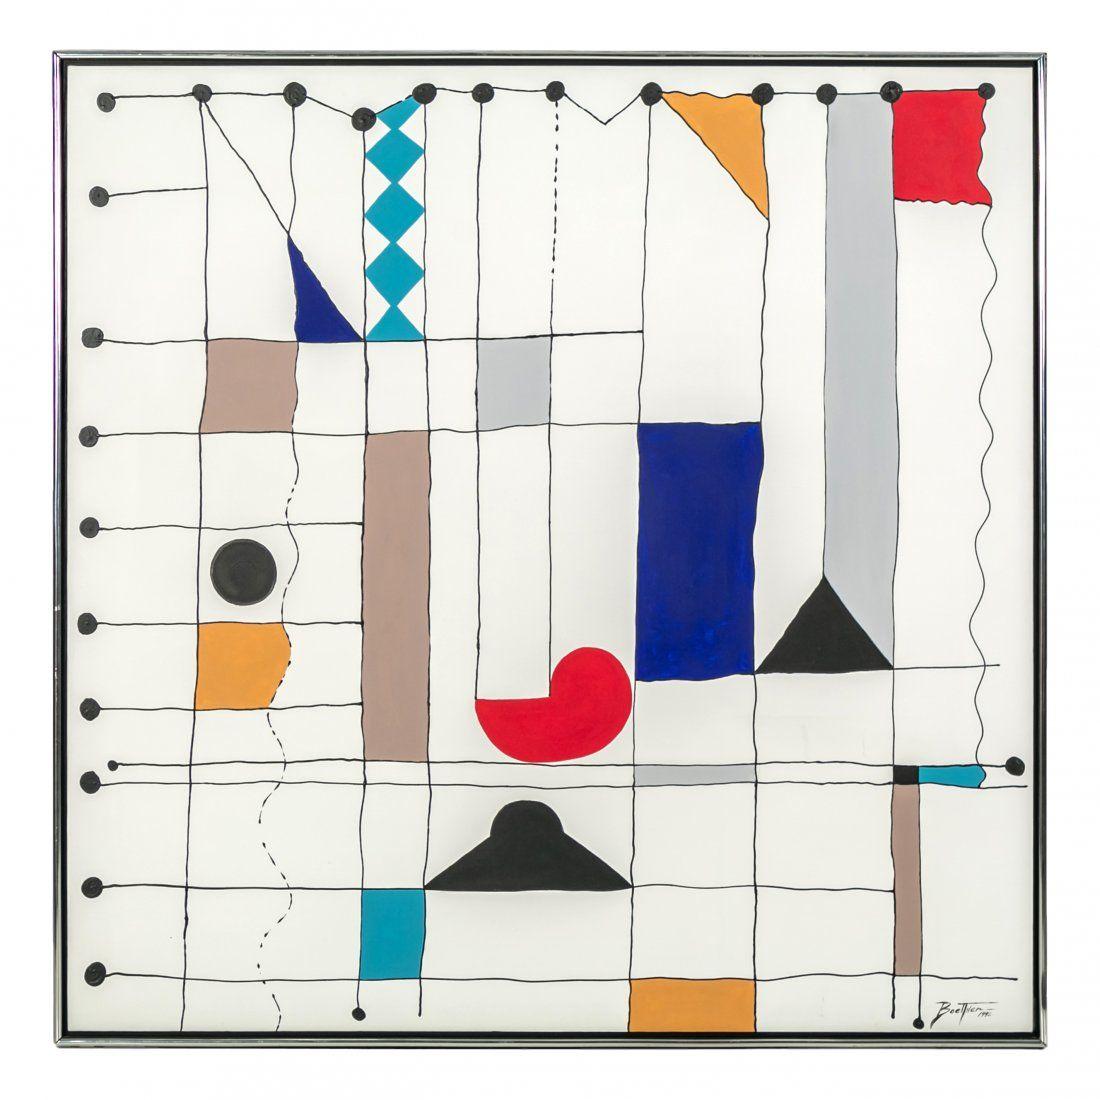 Boettner Abstract Alexander Calder Homage Painting